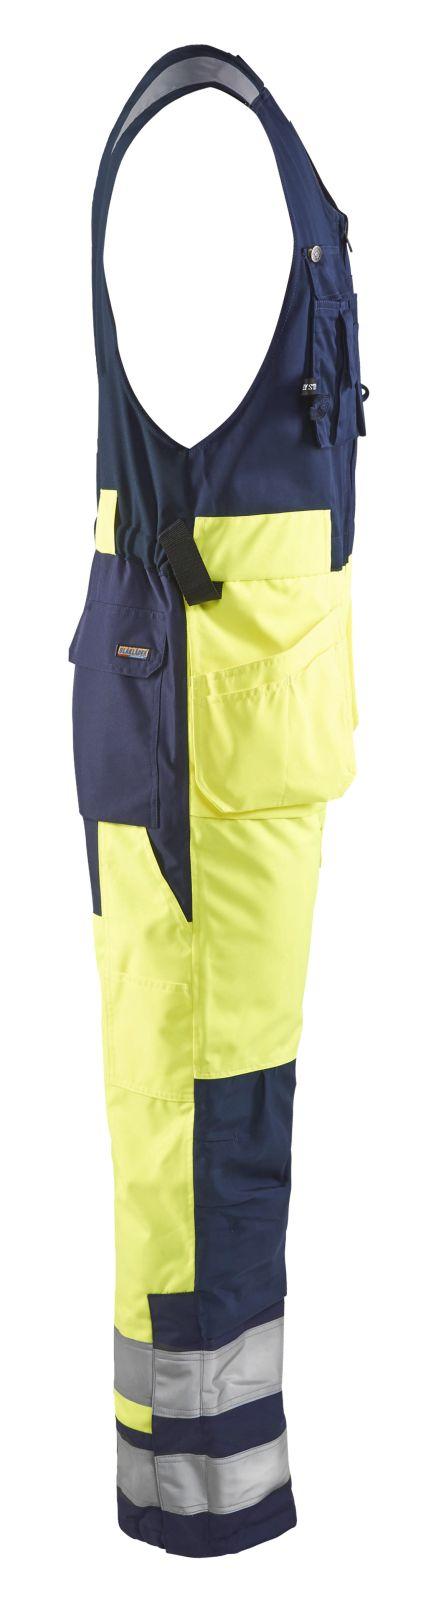 Blaklader Bodybroeken 85041977 High Vis geel-marineblauw(3389)